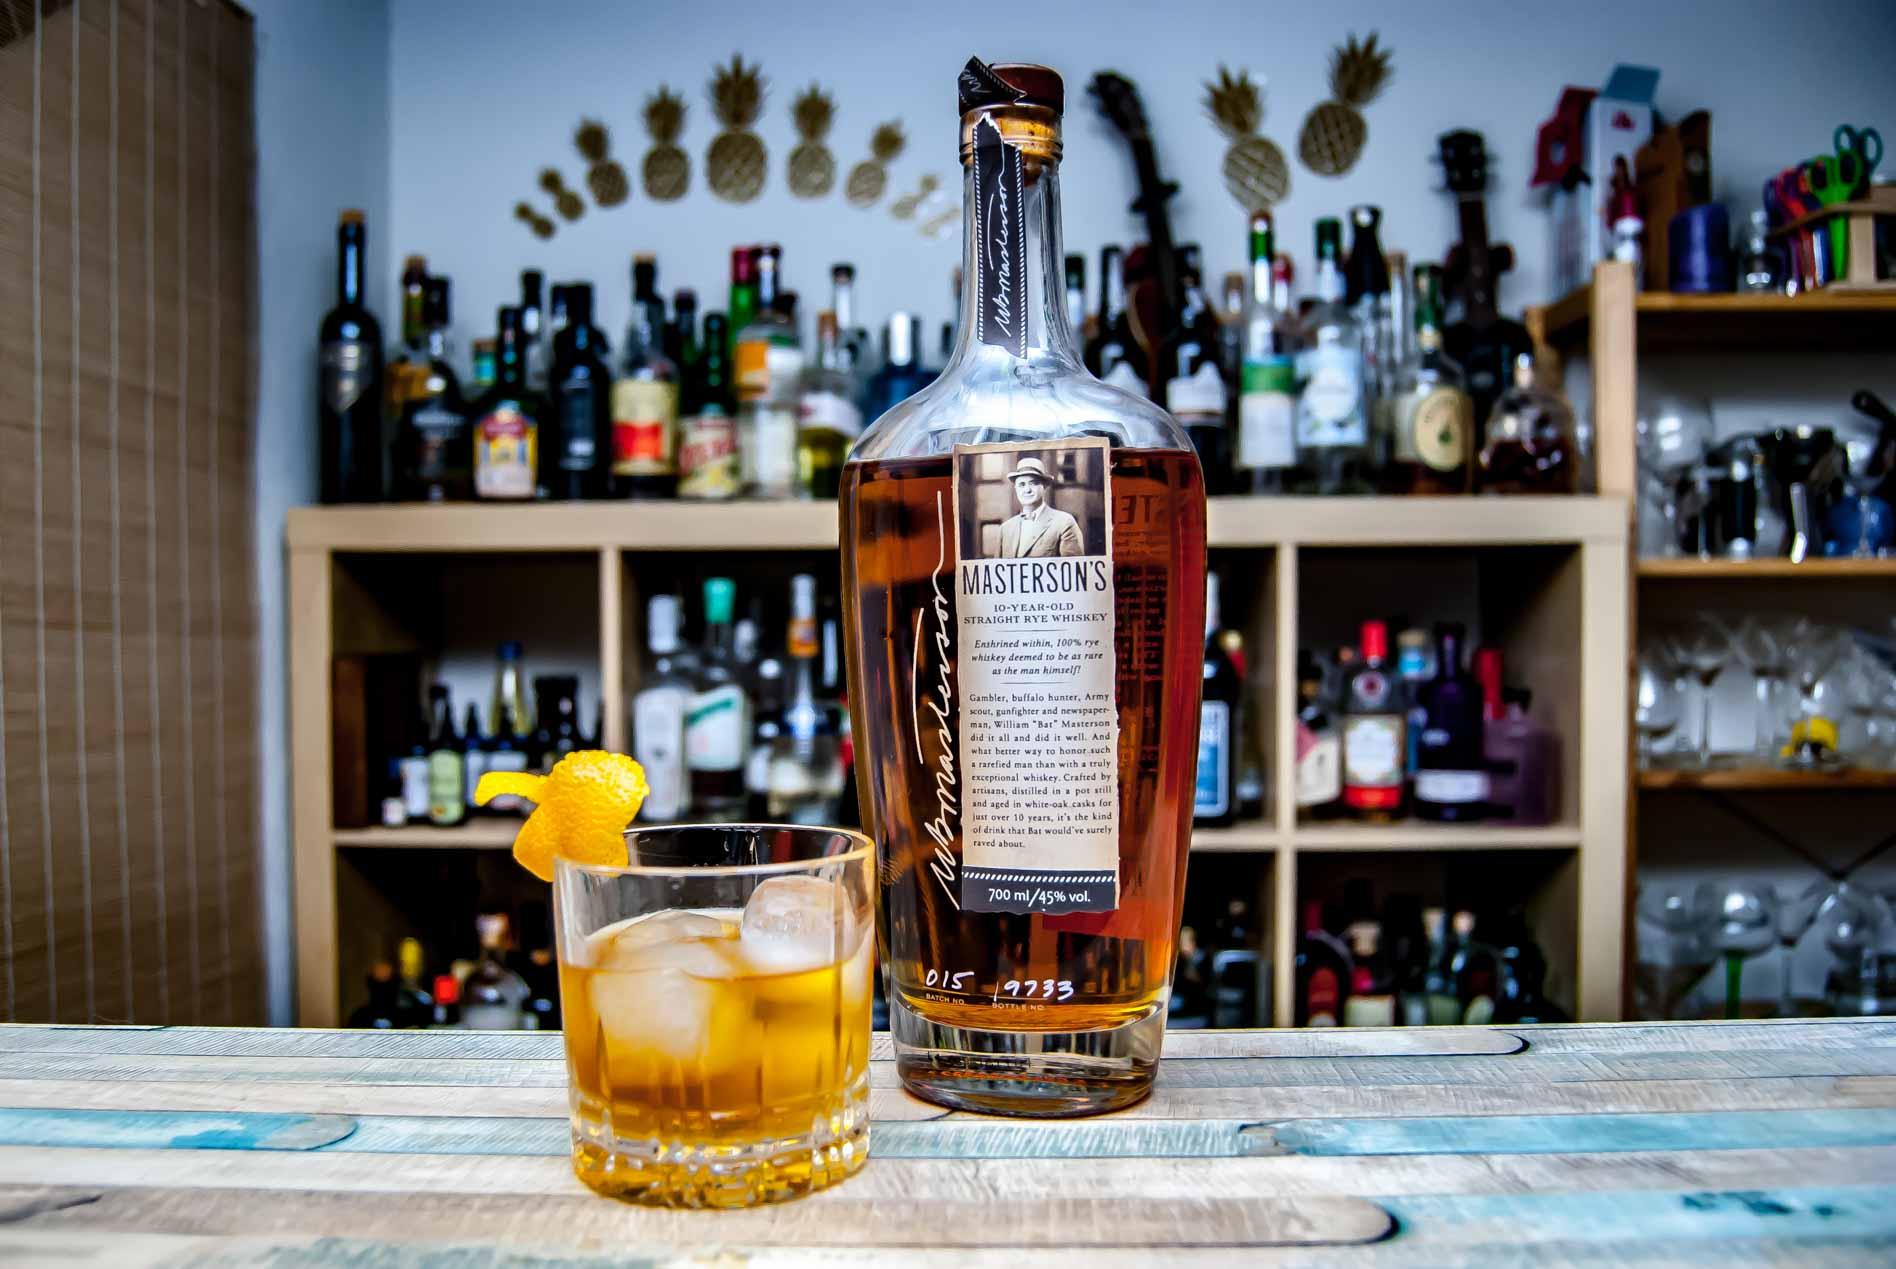 Masteron's Rye Whiskey im Old Fashioned.